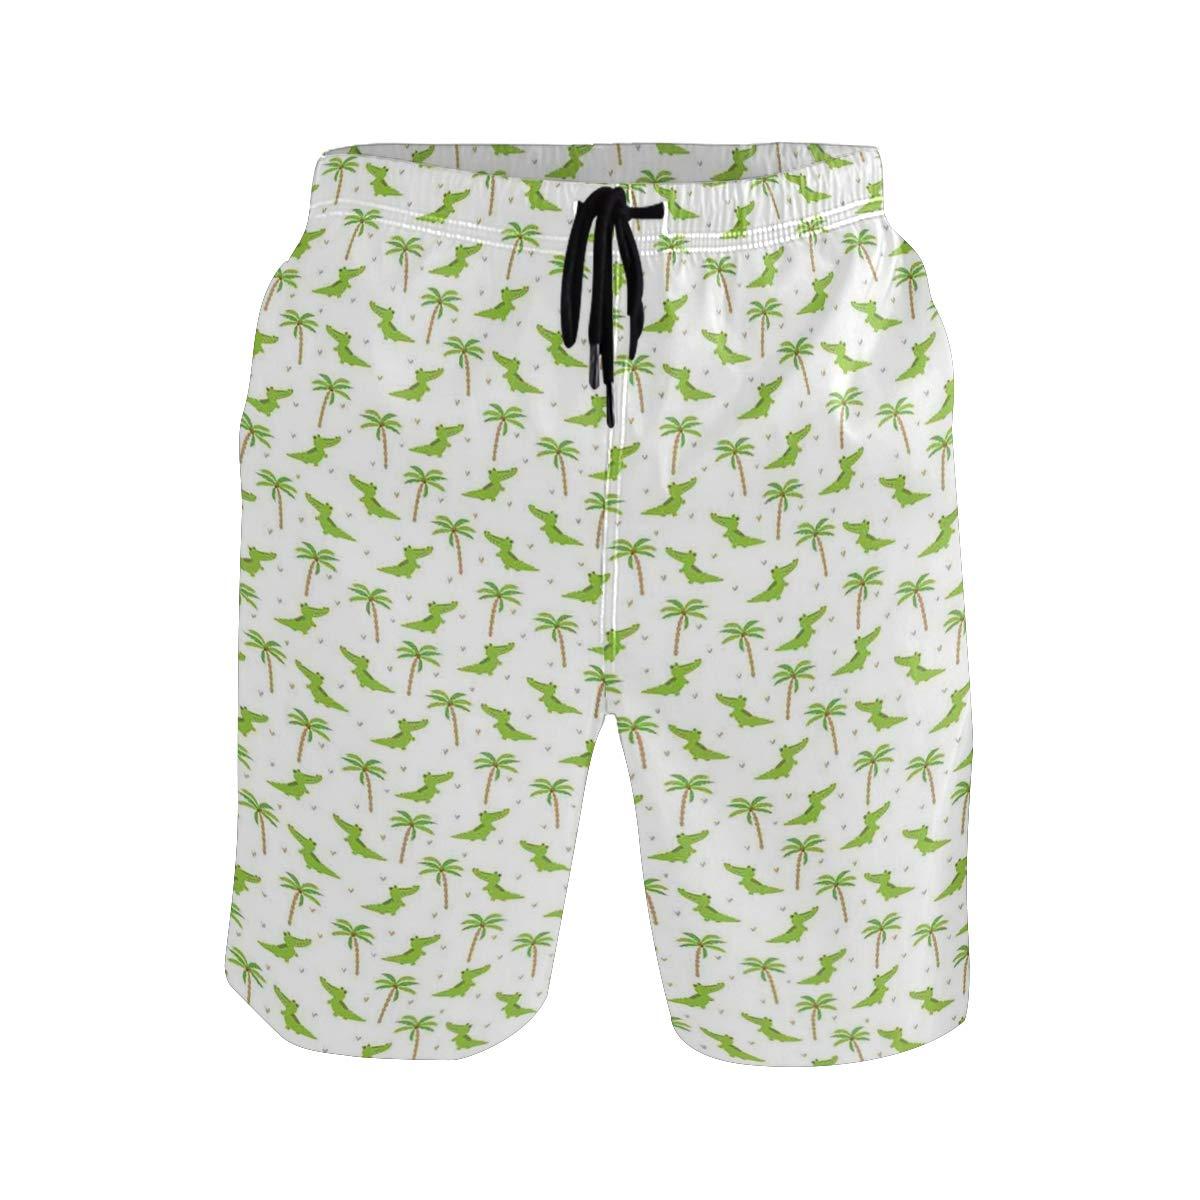 COVASA Mens Summer ShortsCartoon Crocodiles with Tropic Palm Trees Nursery Des